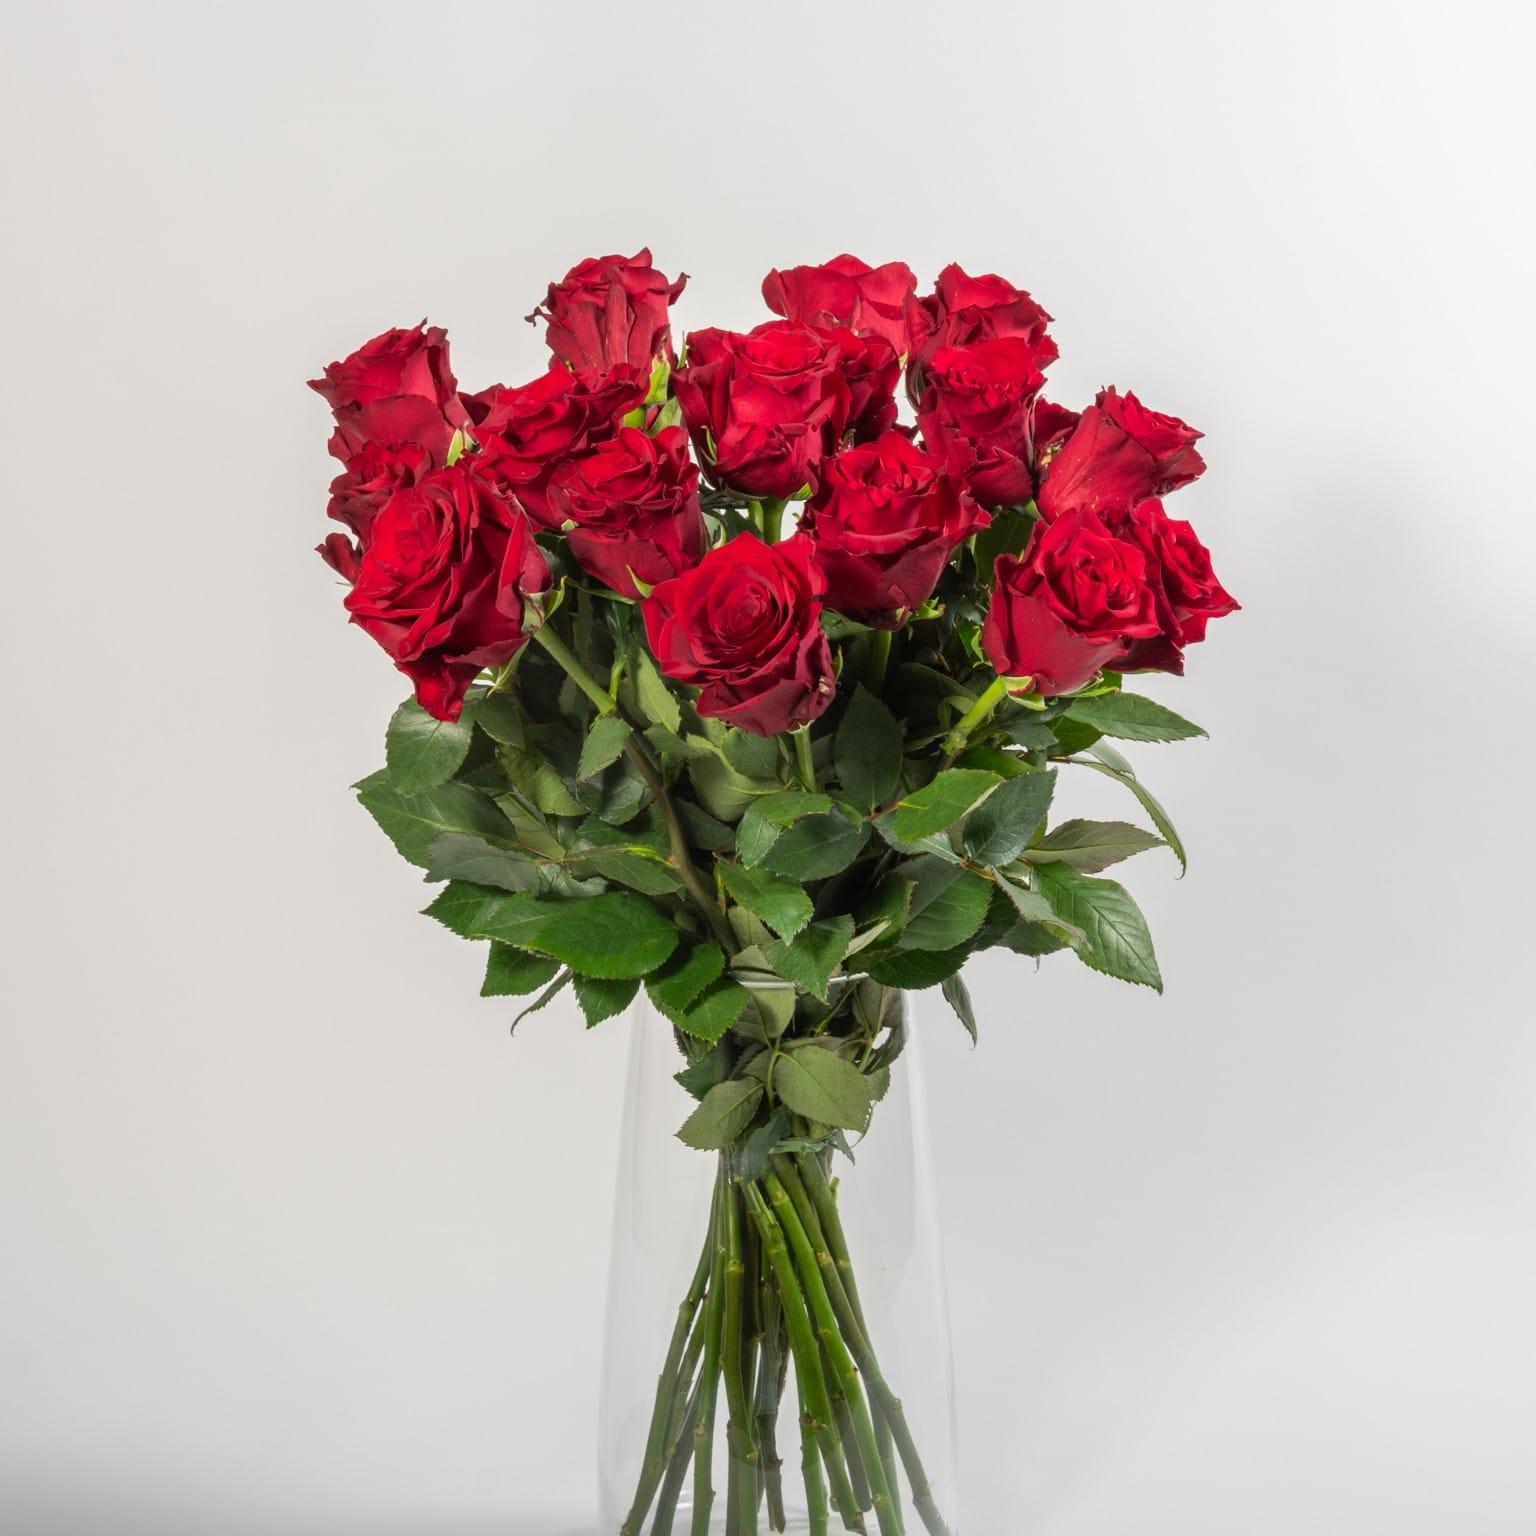 Rote Rosen Videos Kostenlos